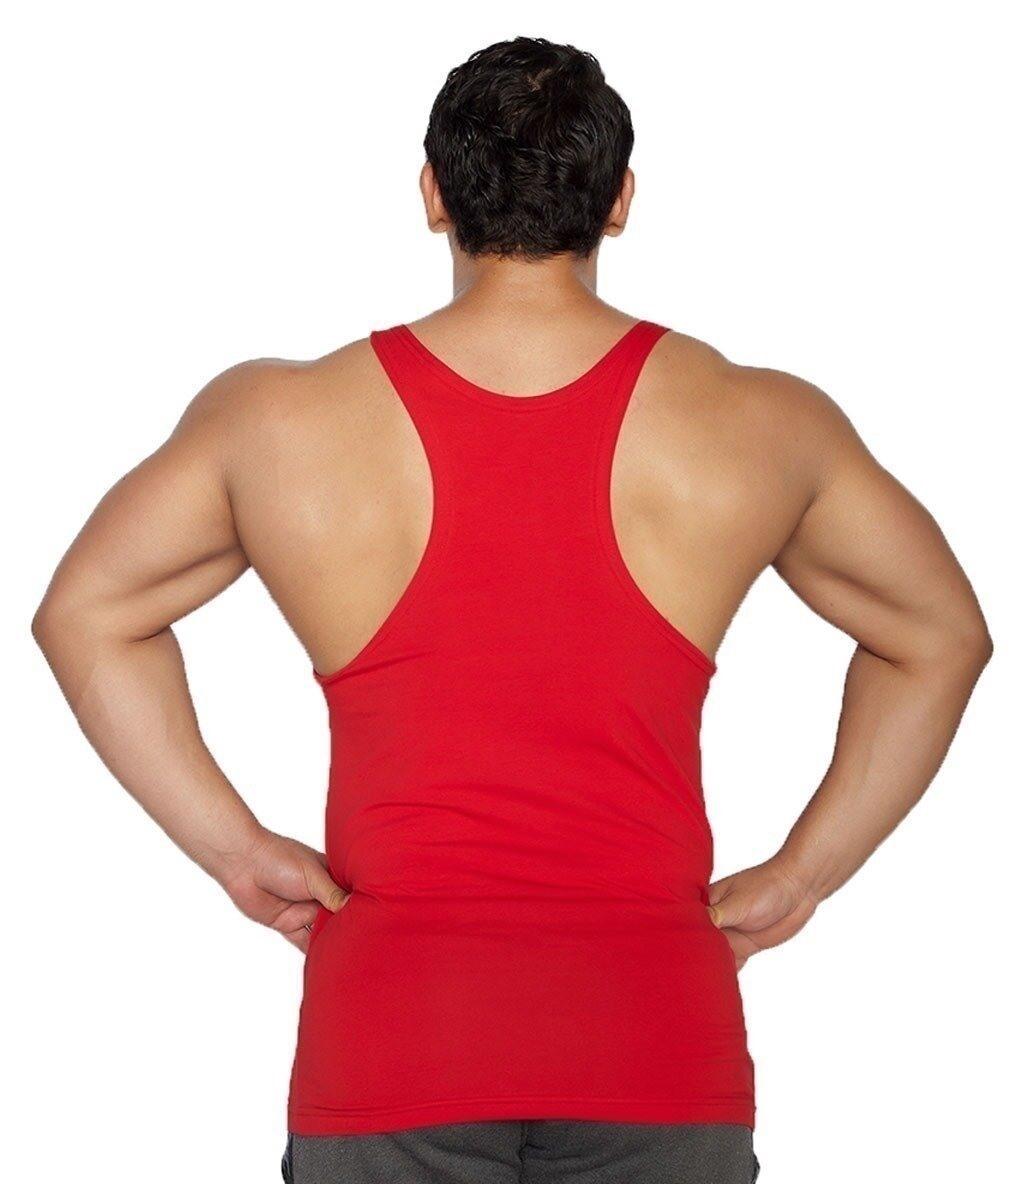 Supplementler.com One More Rep Fitness Atleti Kırmızı